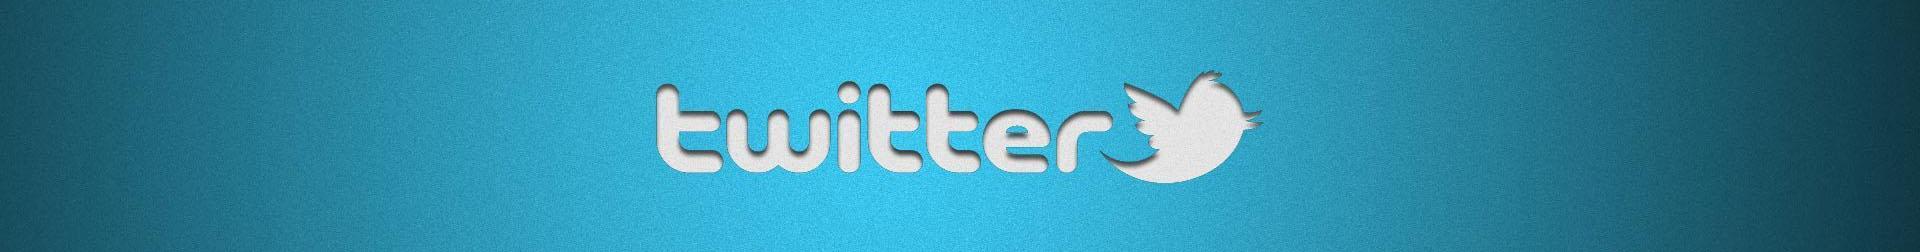 Накрутка твиттер. Накрутка твиттера онлайн. Накрутка twitter.